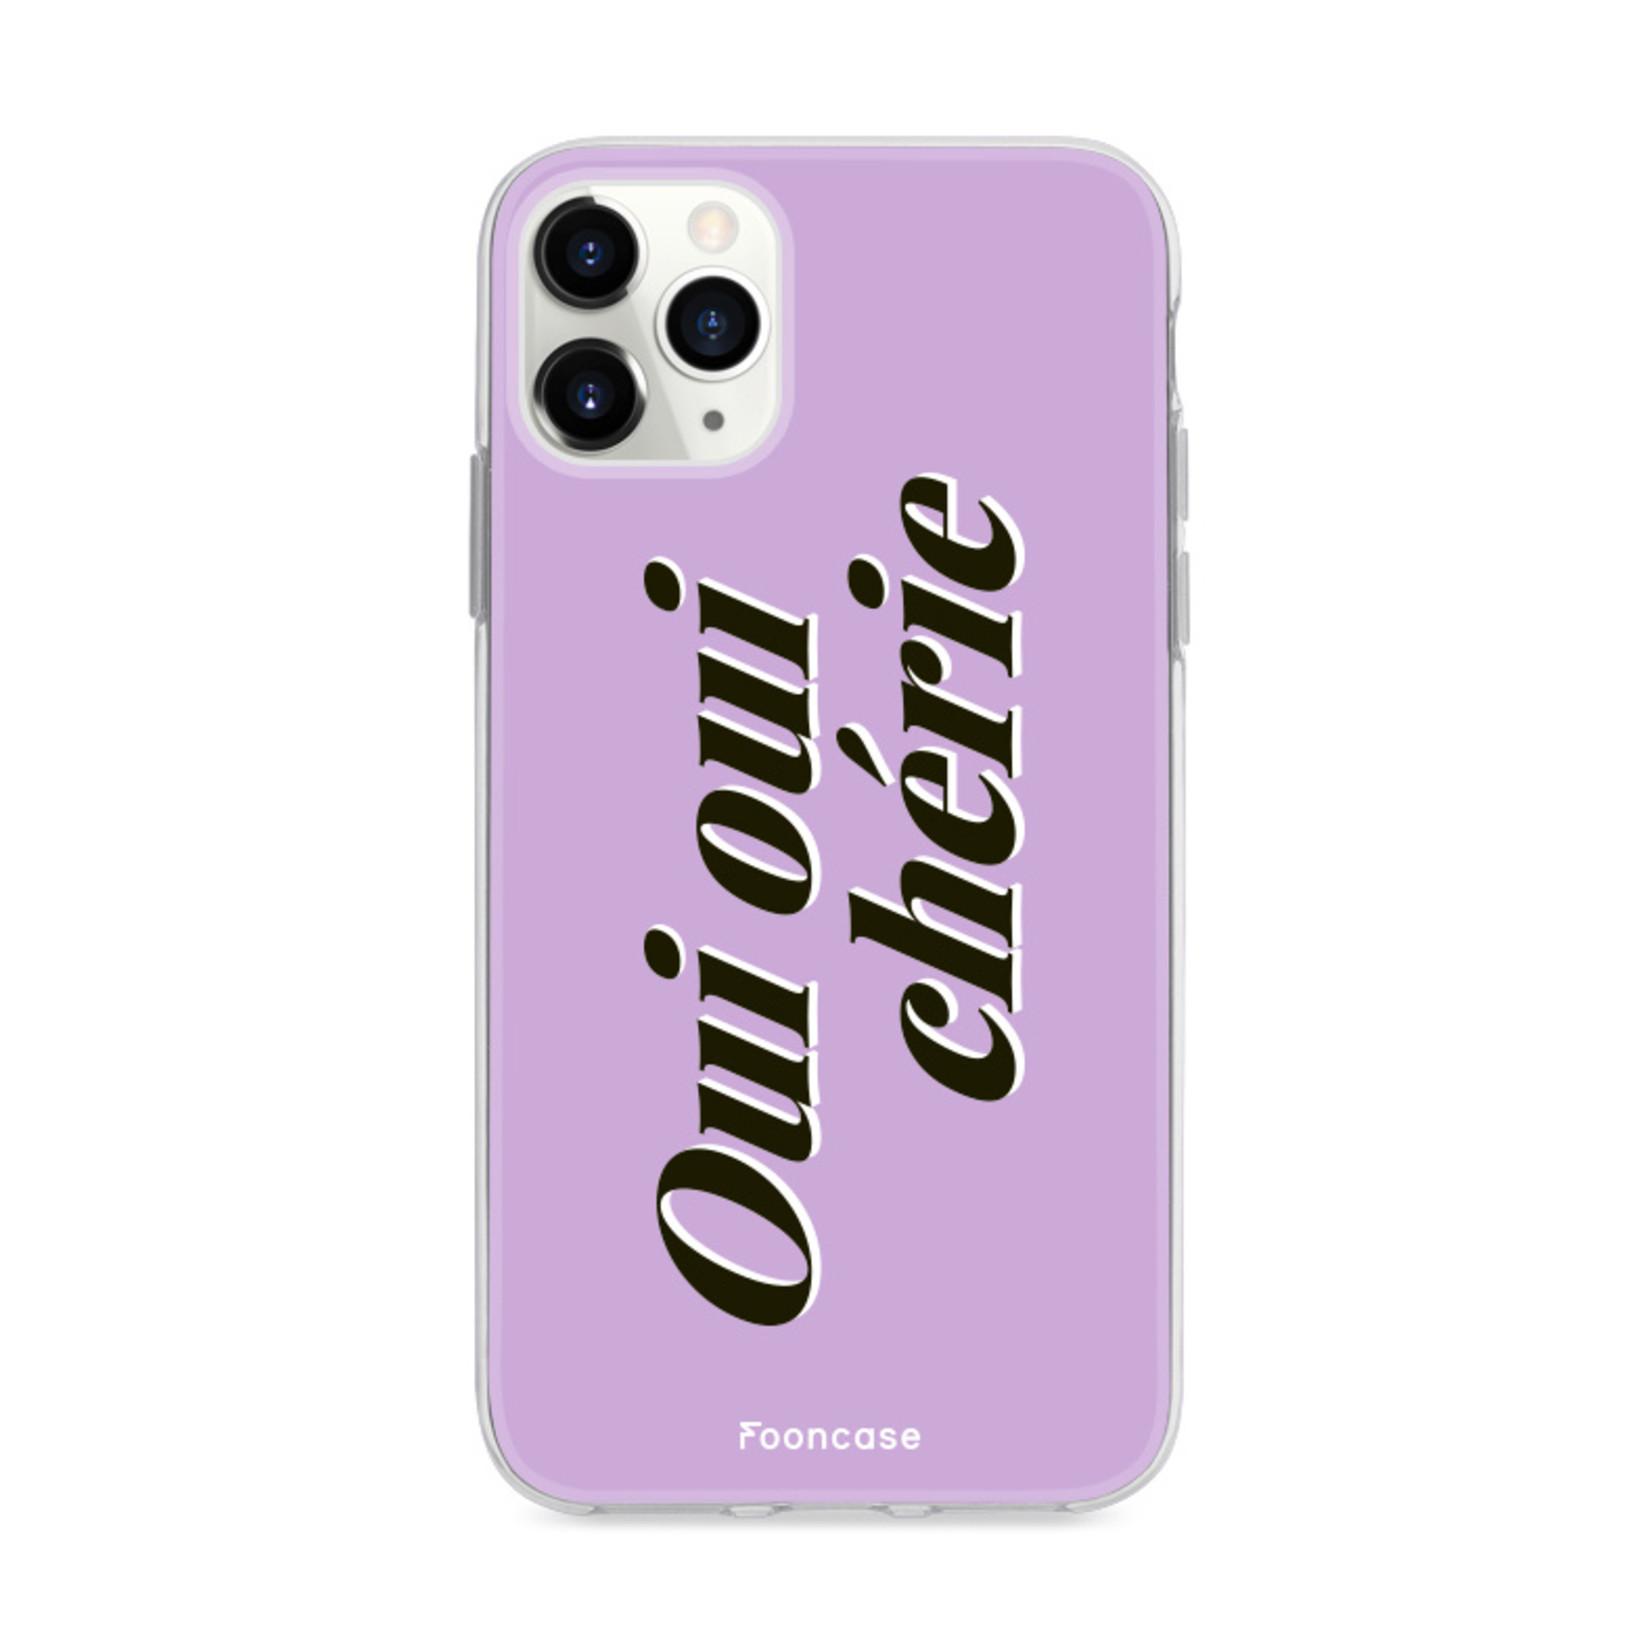 FOONCASE iPhone 12 Pro hoesje TPU Soft Case - Back Cover - Oui Oui Chérie / Lila Paars & Wit